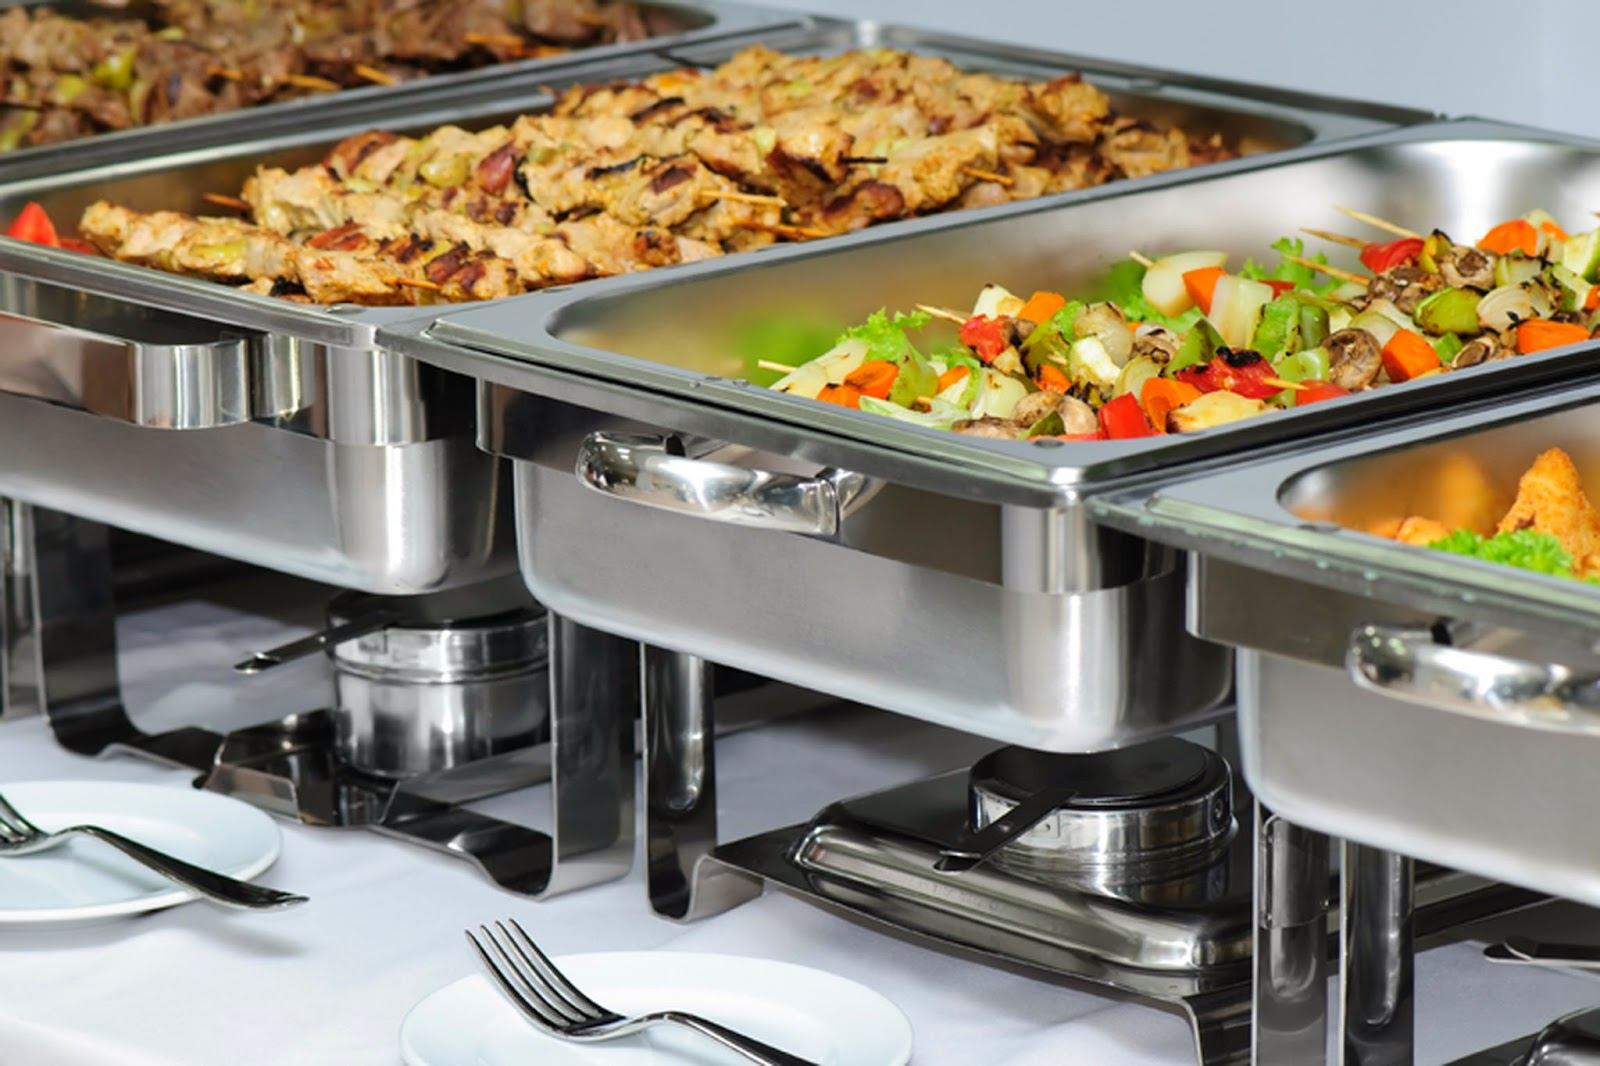 chafing dish sau vasul de incalzire, pastrare calda alimente, servire bufet cald